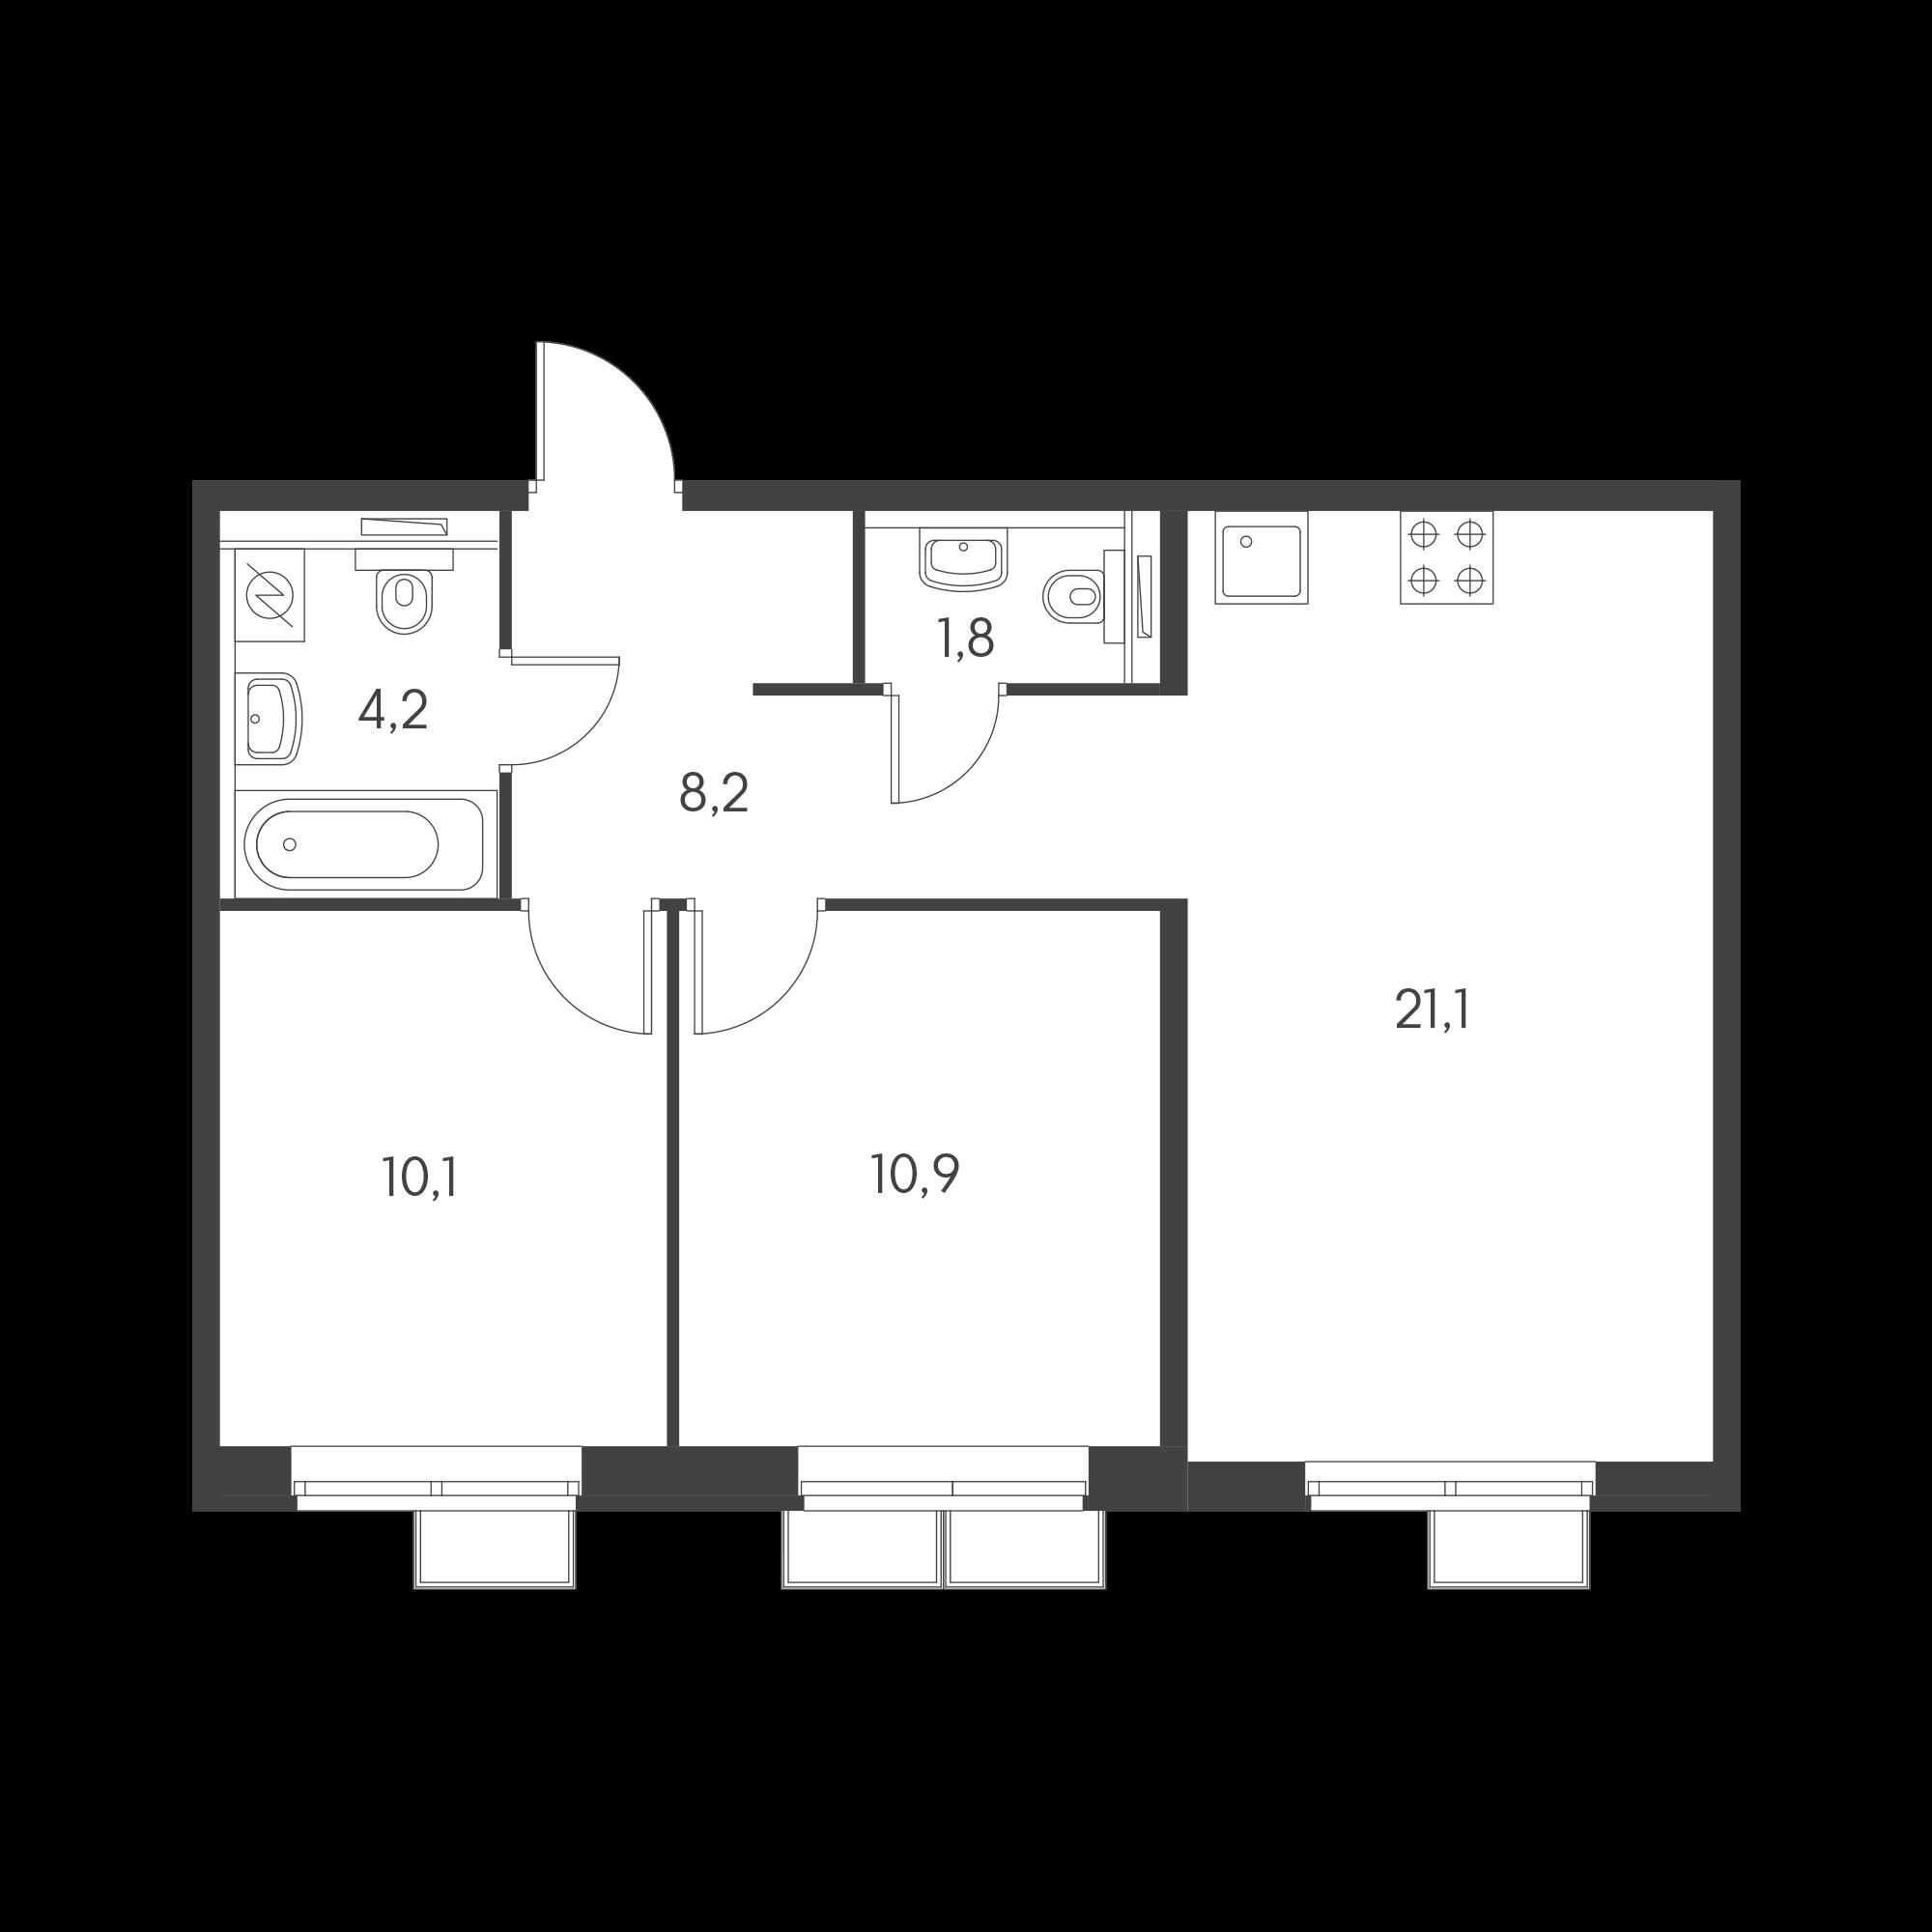 2EM7_9.9-2